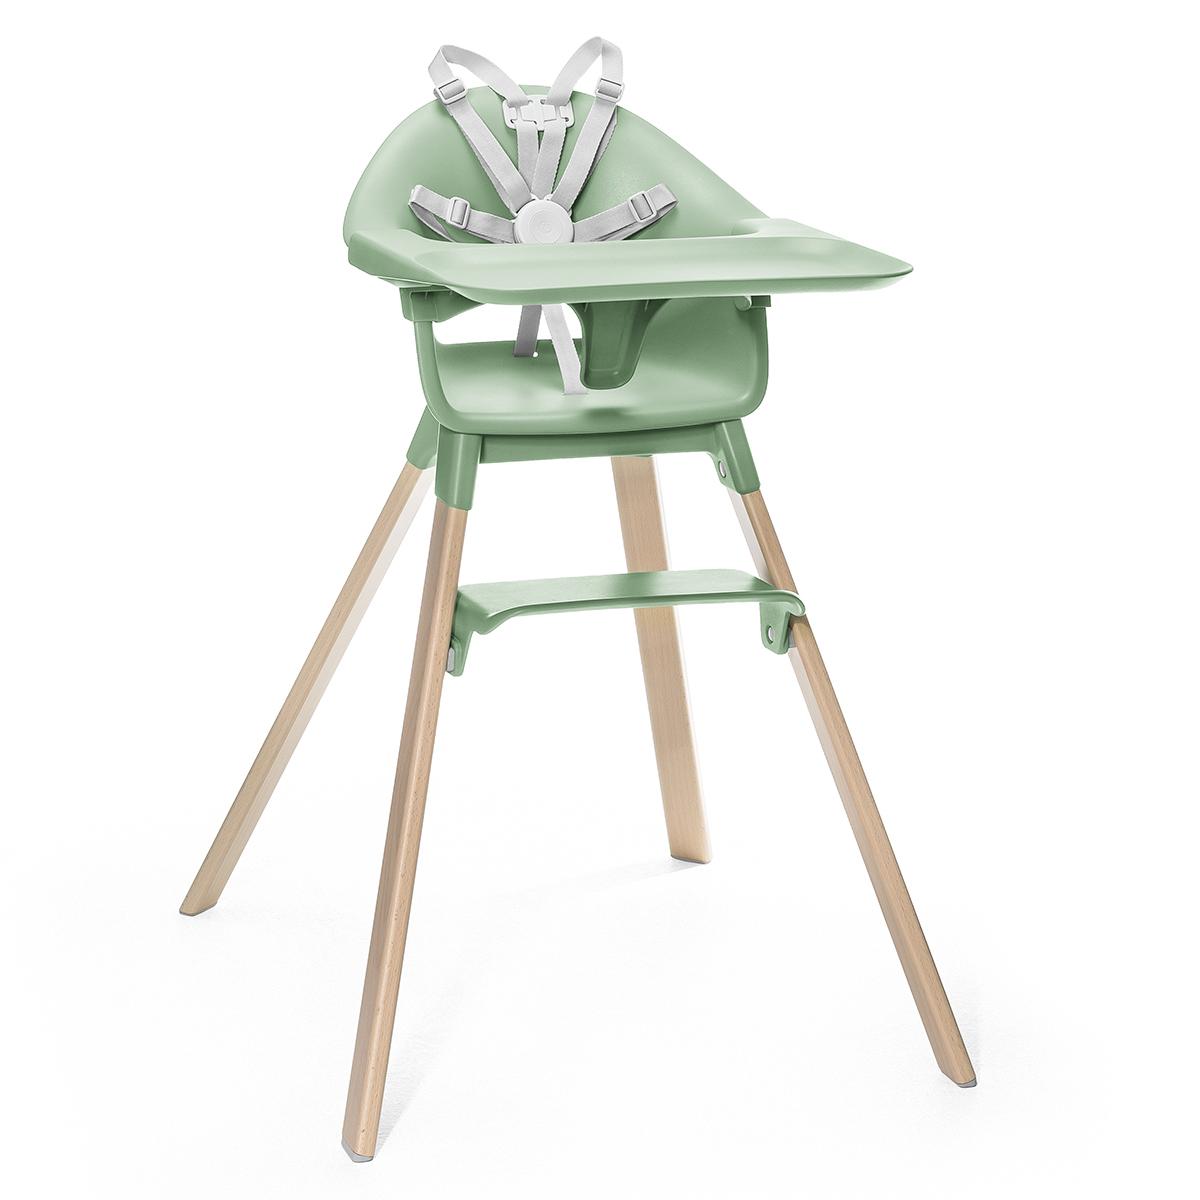 Chaise haute Chaise Haute Clikk - Vert Trèfle Chaise Haute Clikk - Vert Trèfle